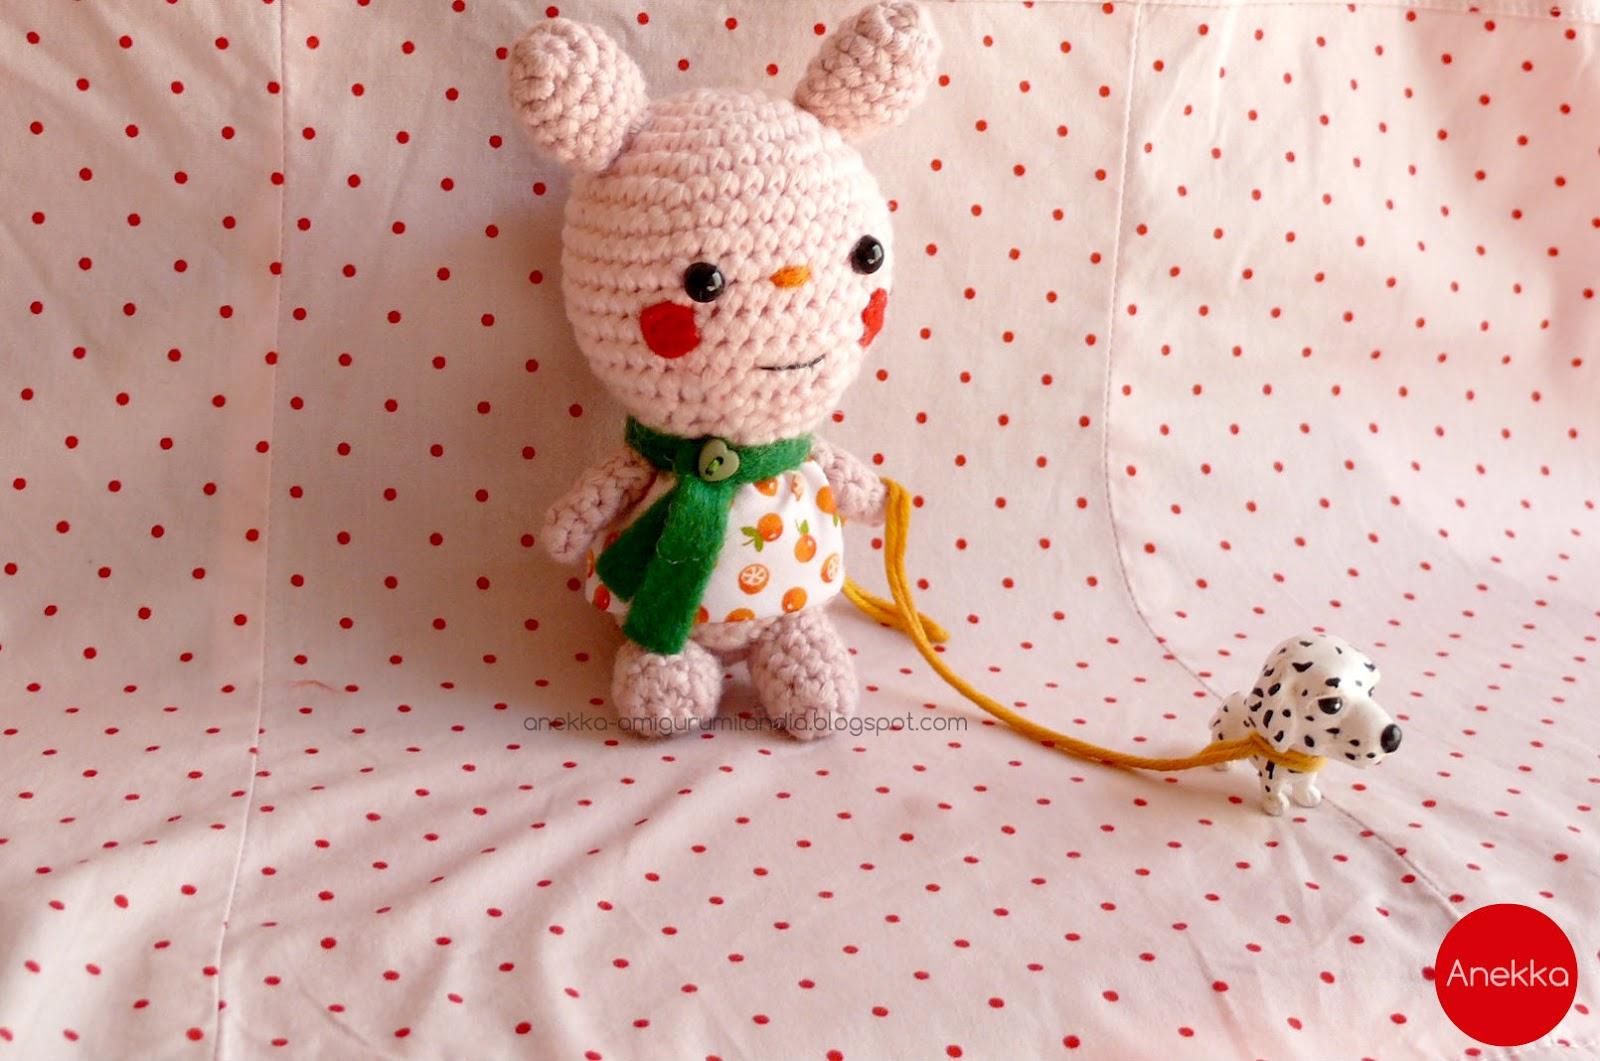 bunny crochet doll  Anekka handmade